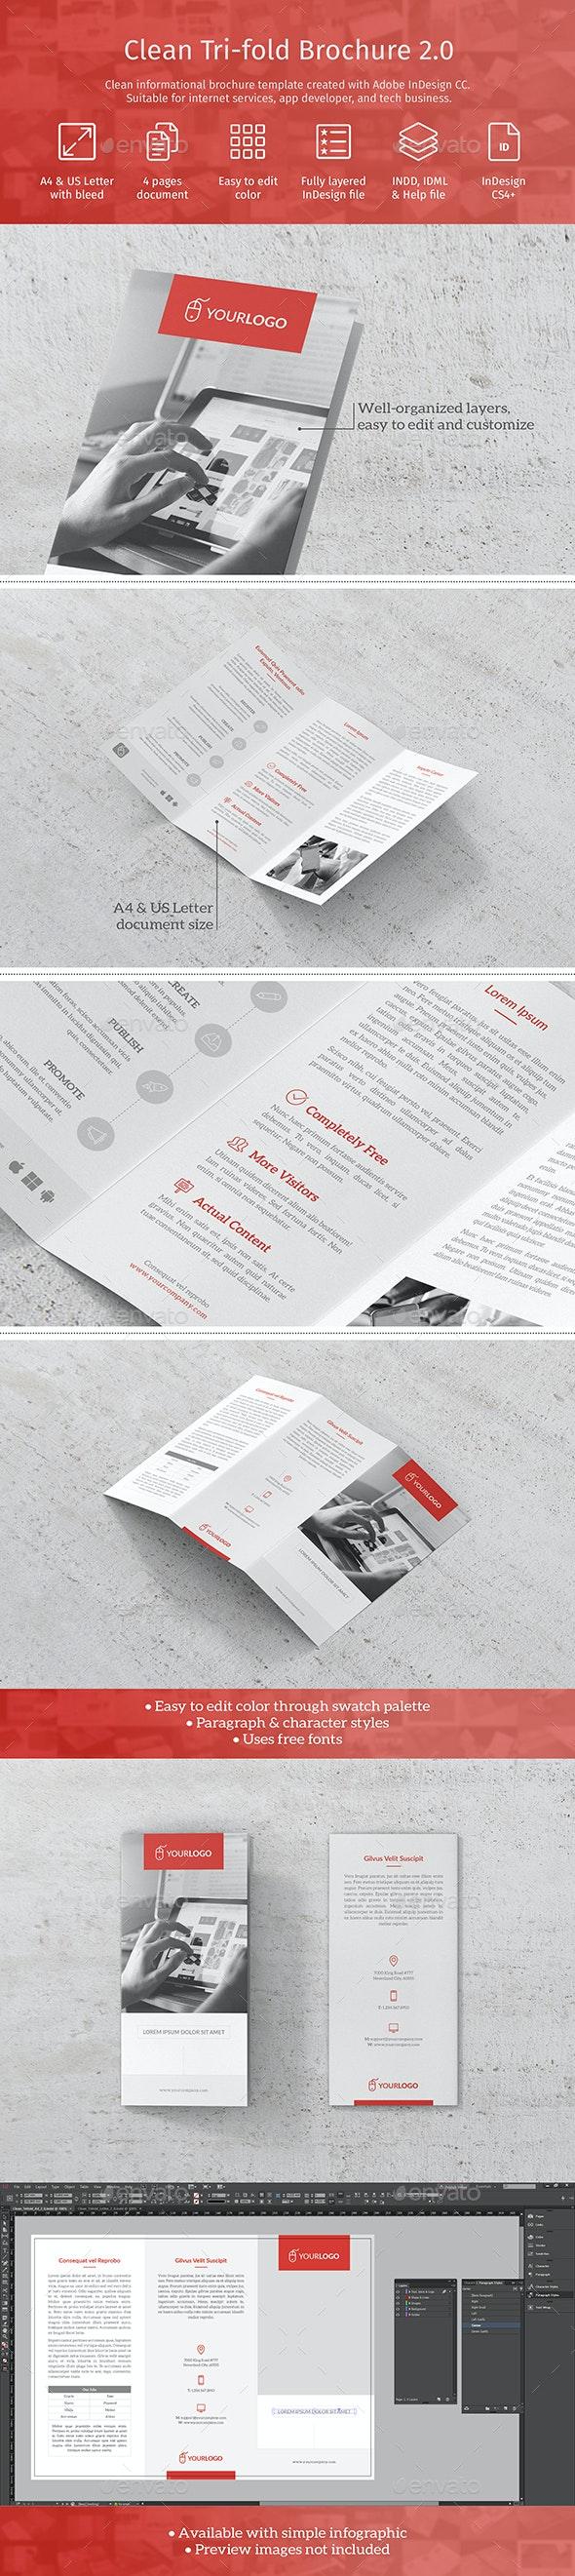 Clean Trifold Brochure - Informational Brochures